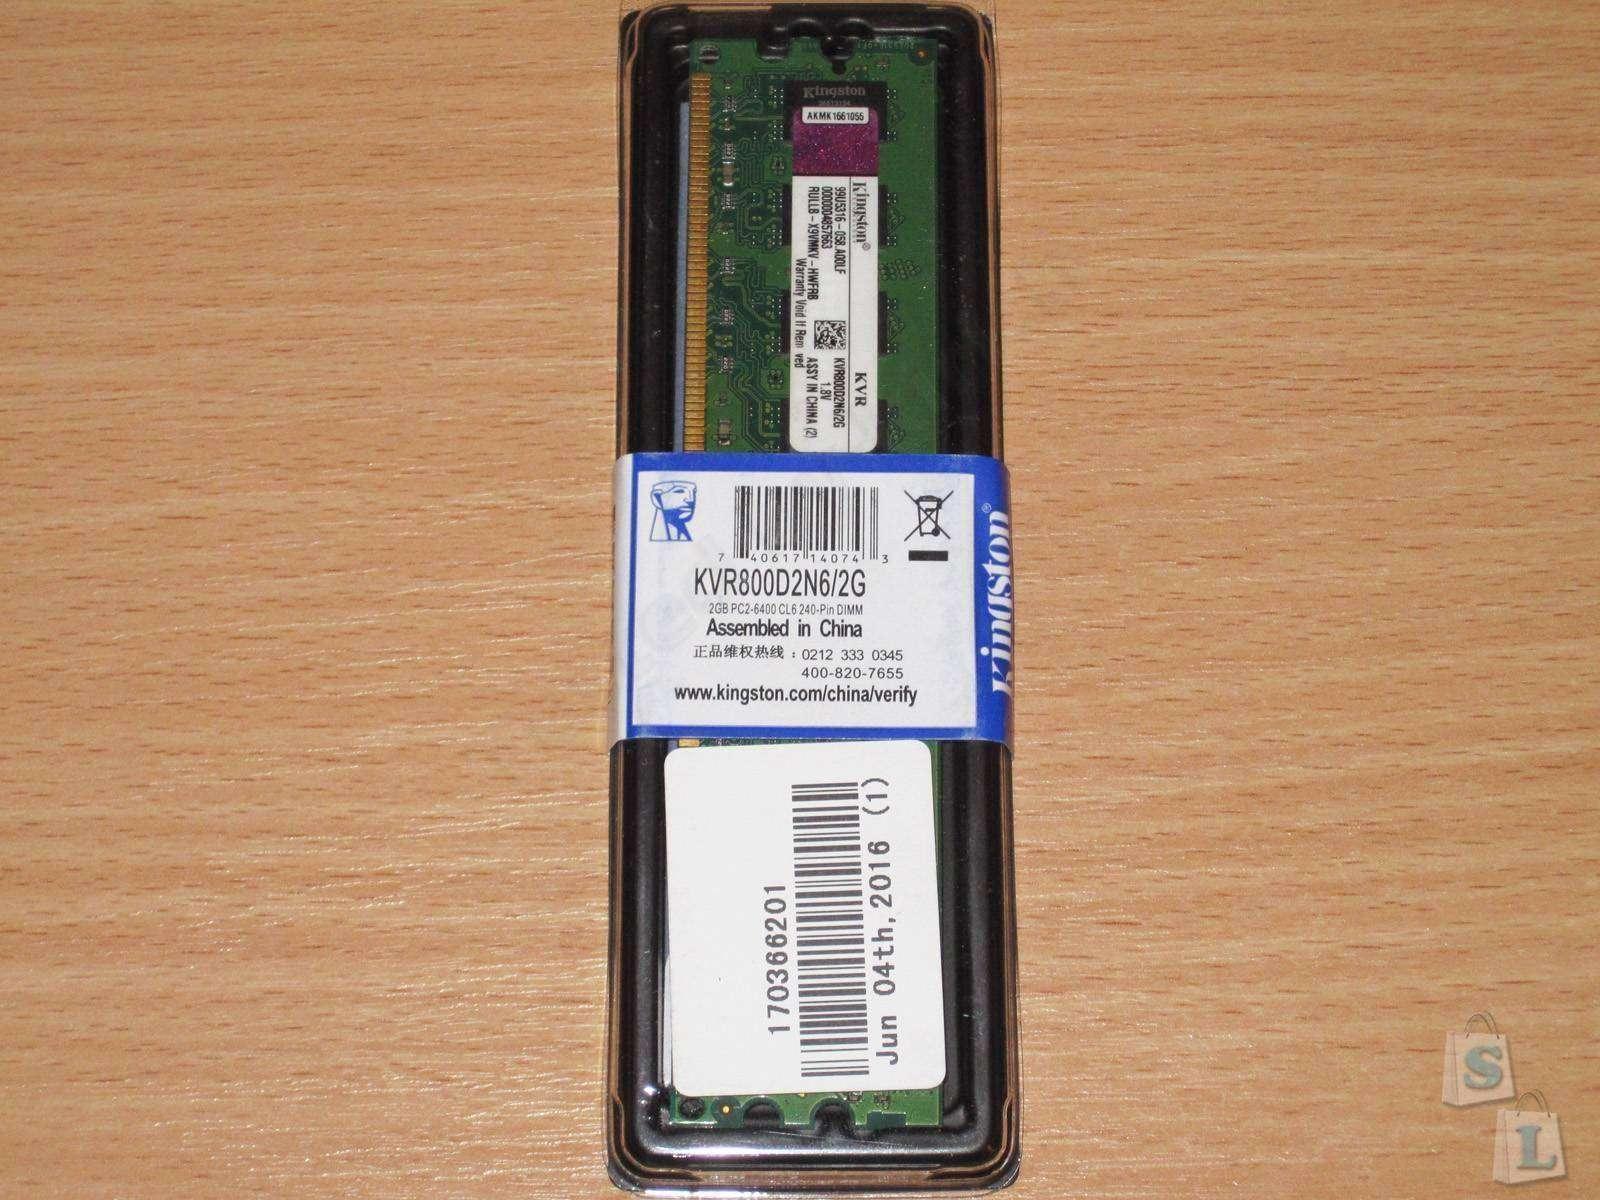 GearBest: 2GB DDR2 Kingston KVR800D2N6 или небольшой обзор еще одного модуля памяти